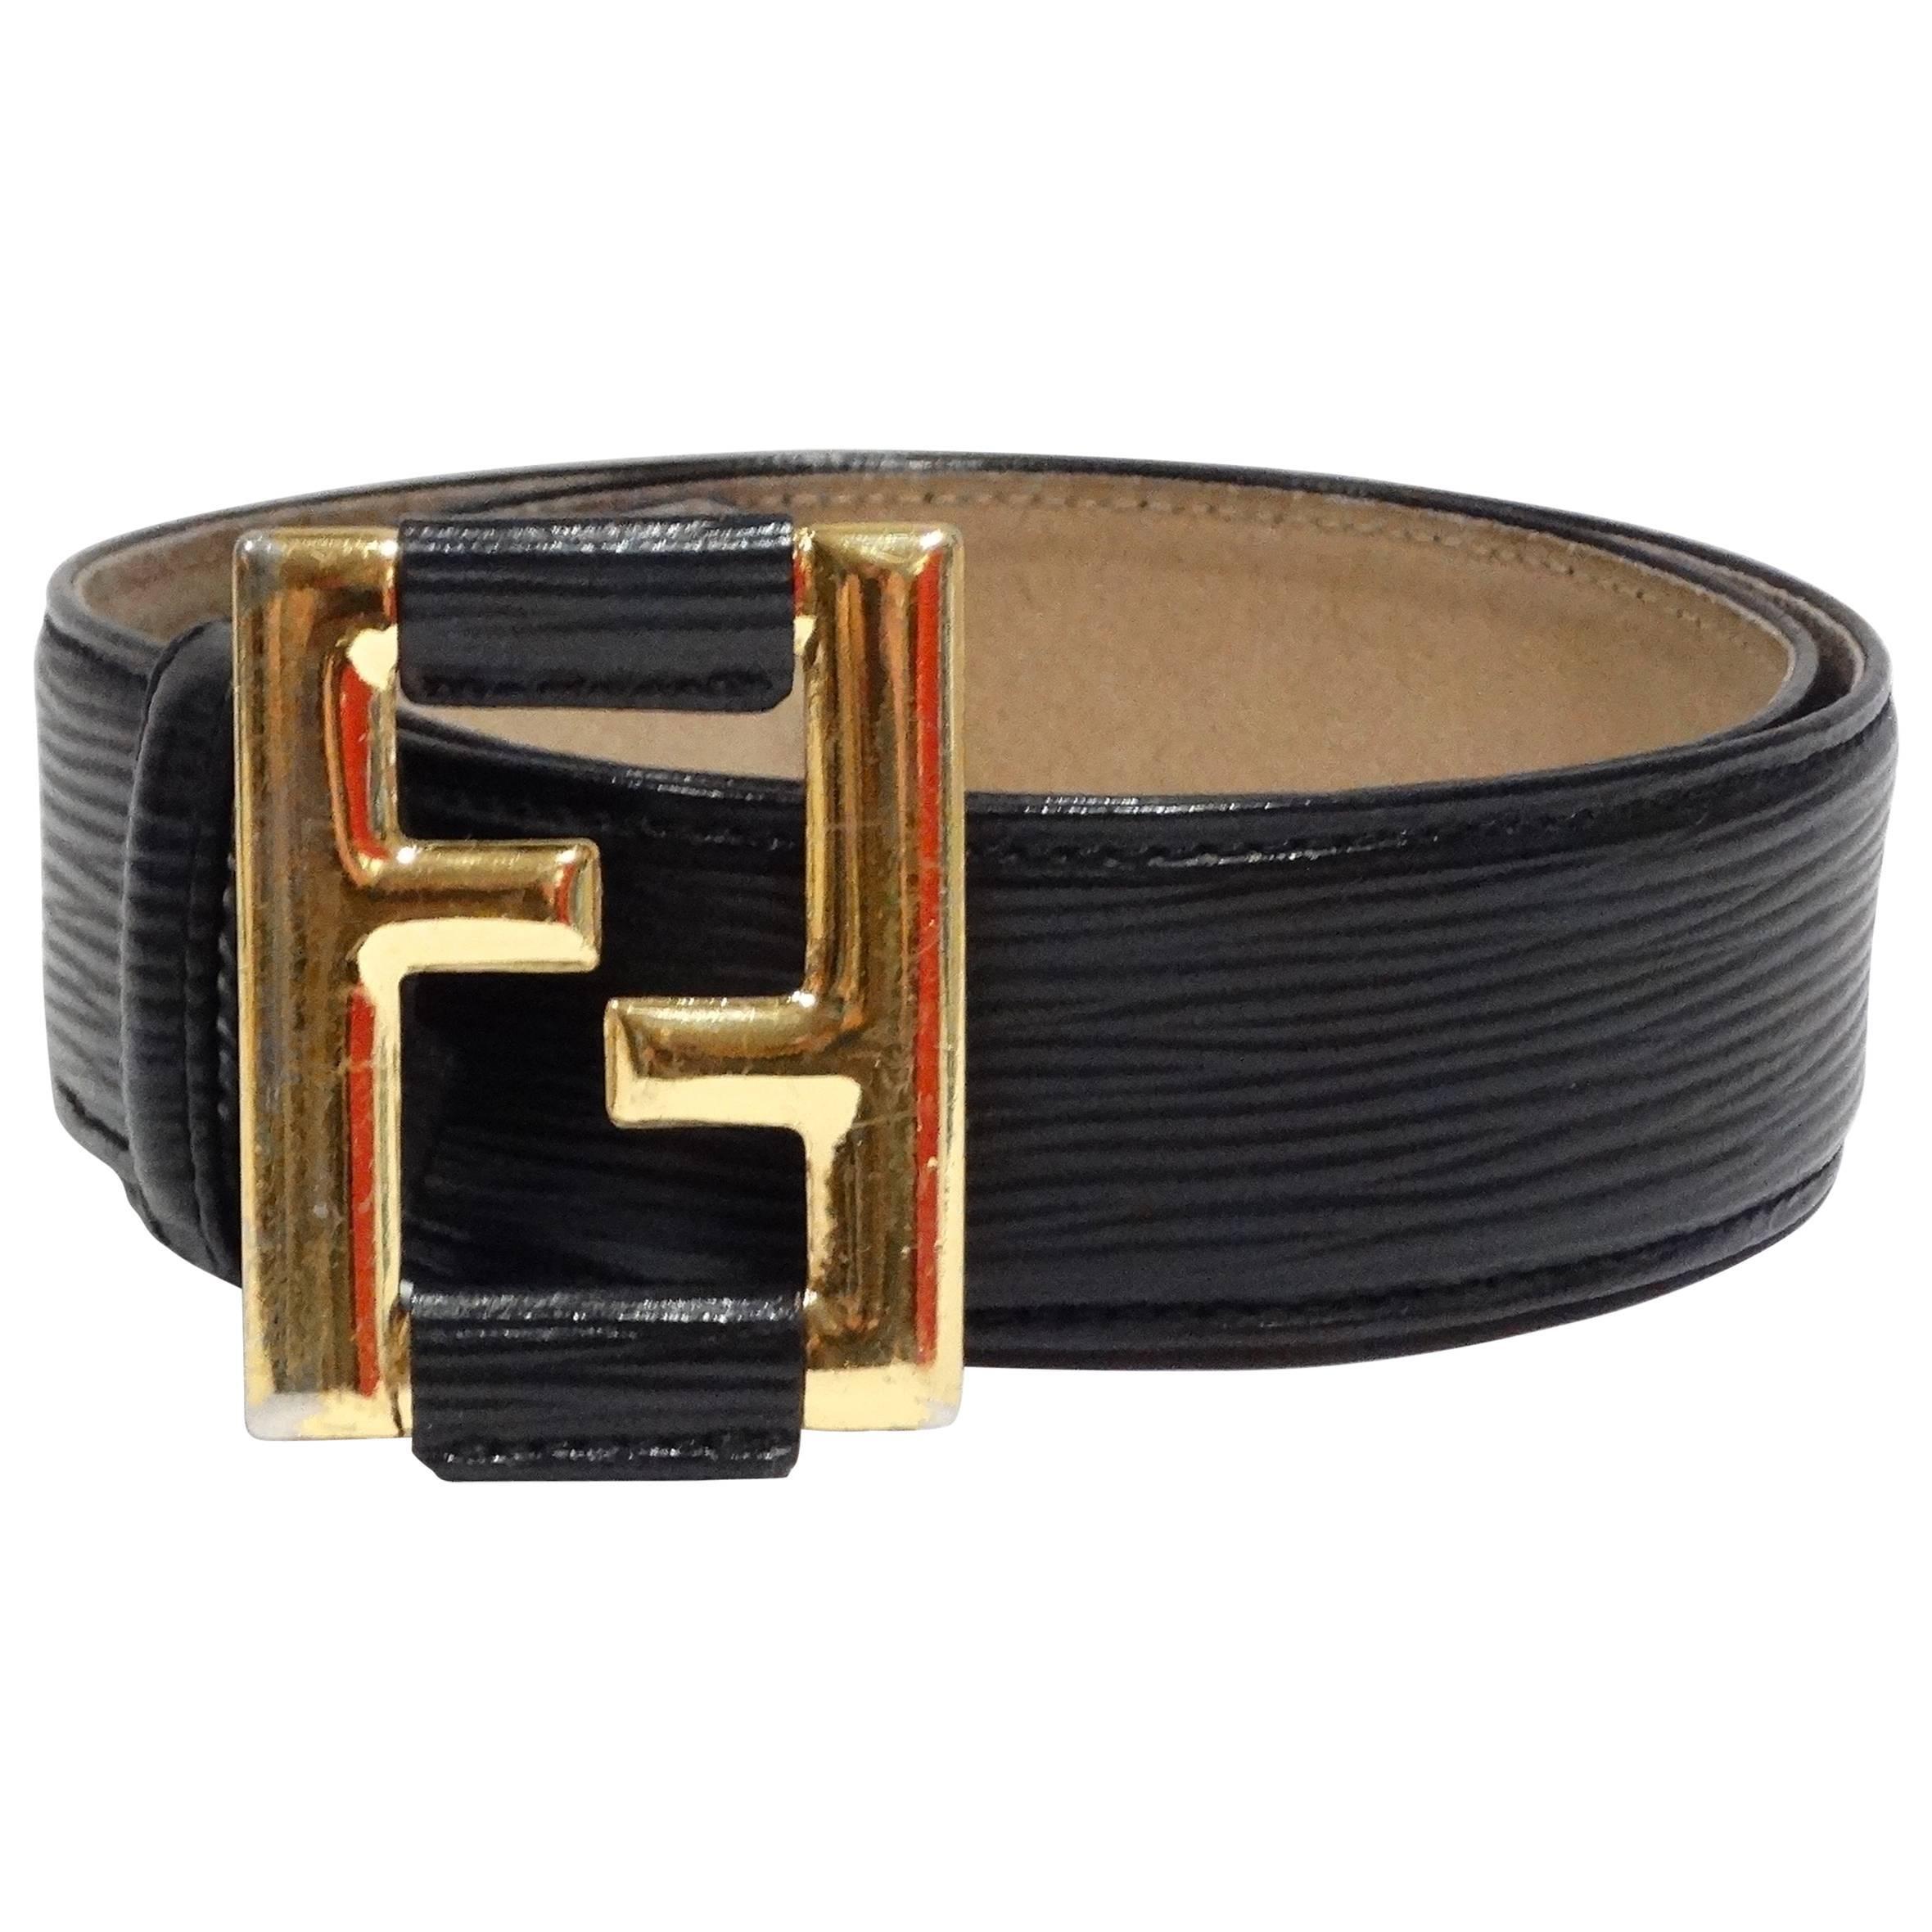 63ef3dd4bd3b2 Fendi Black patent leather trim clear plastic belt For Sale at 1stdibs